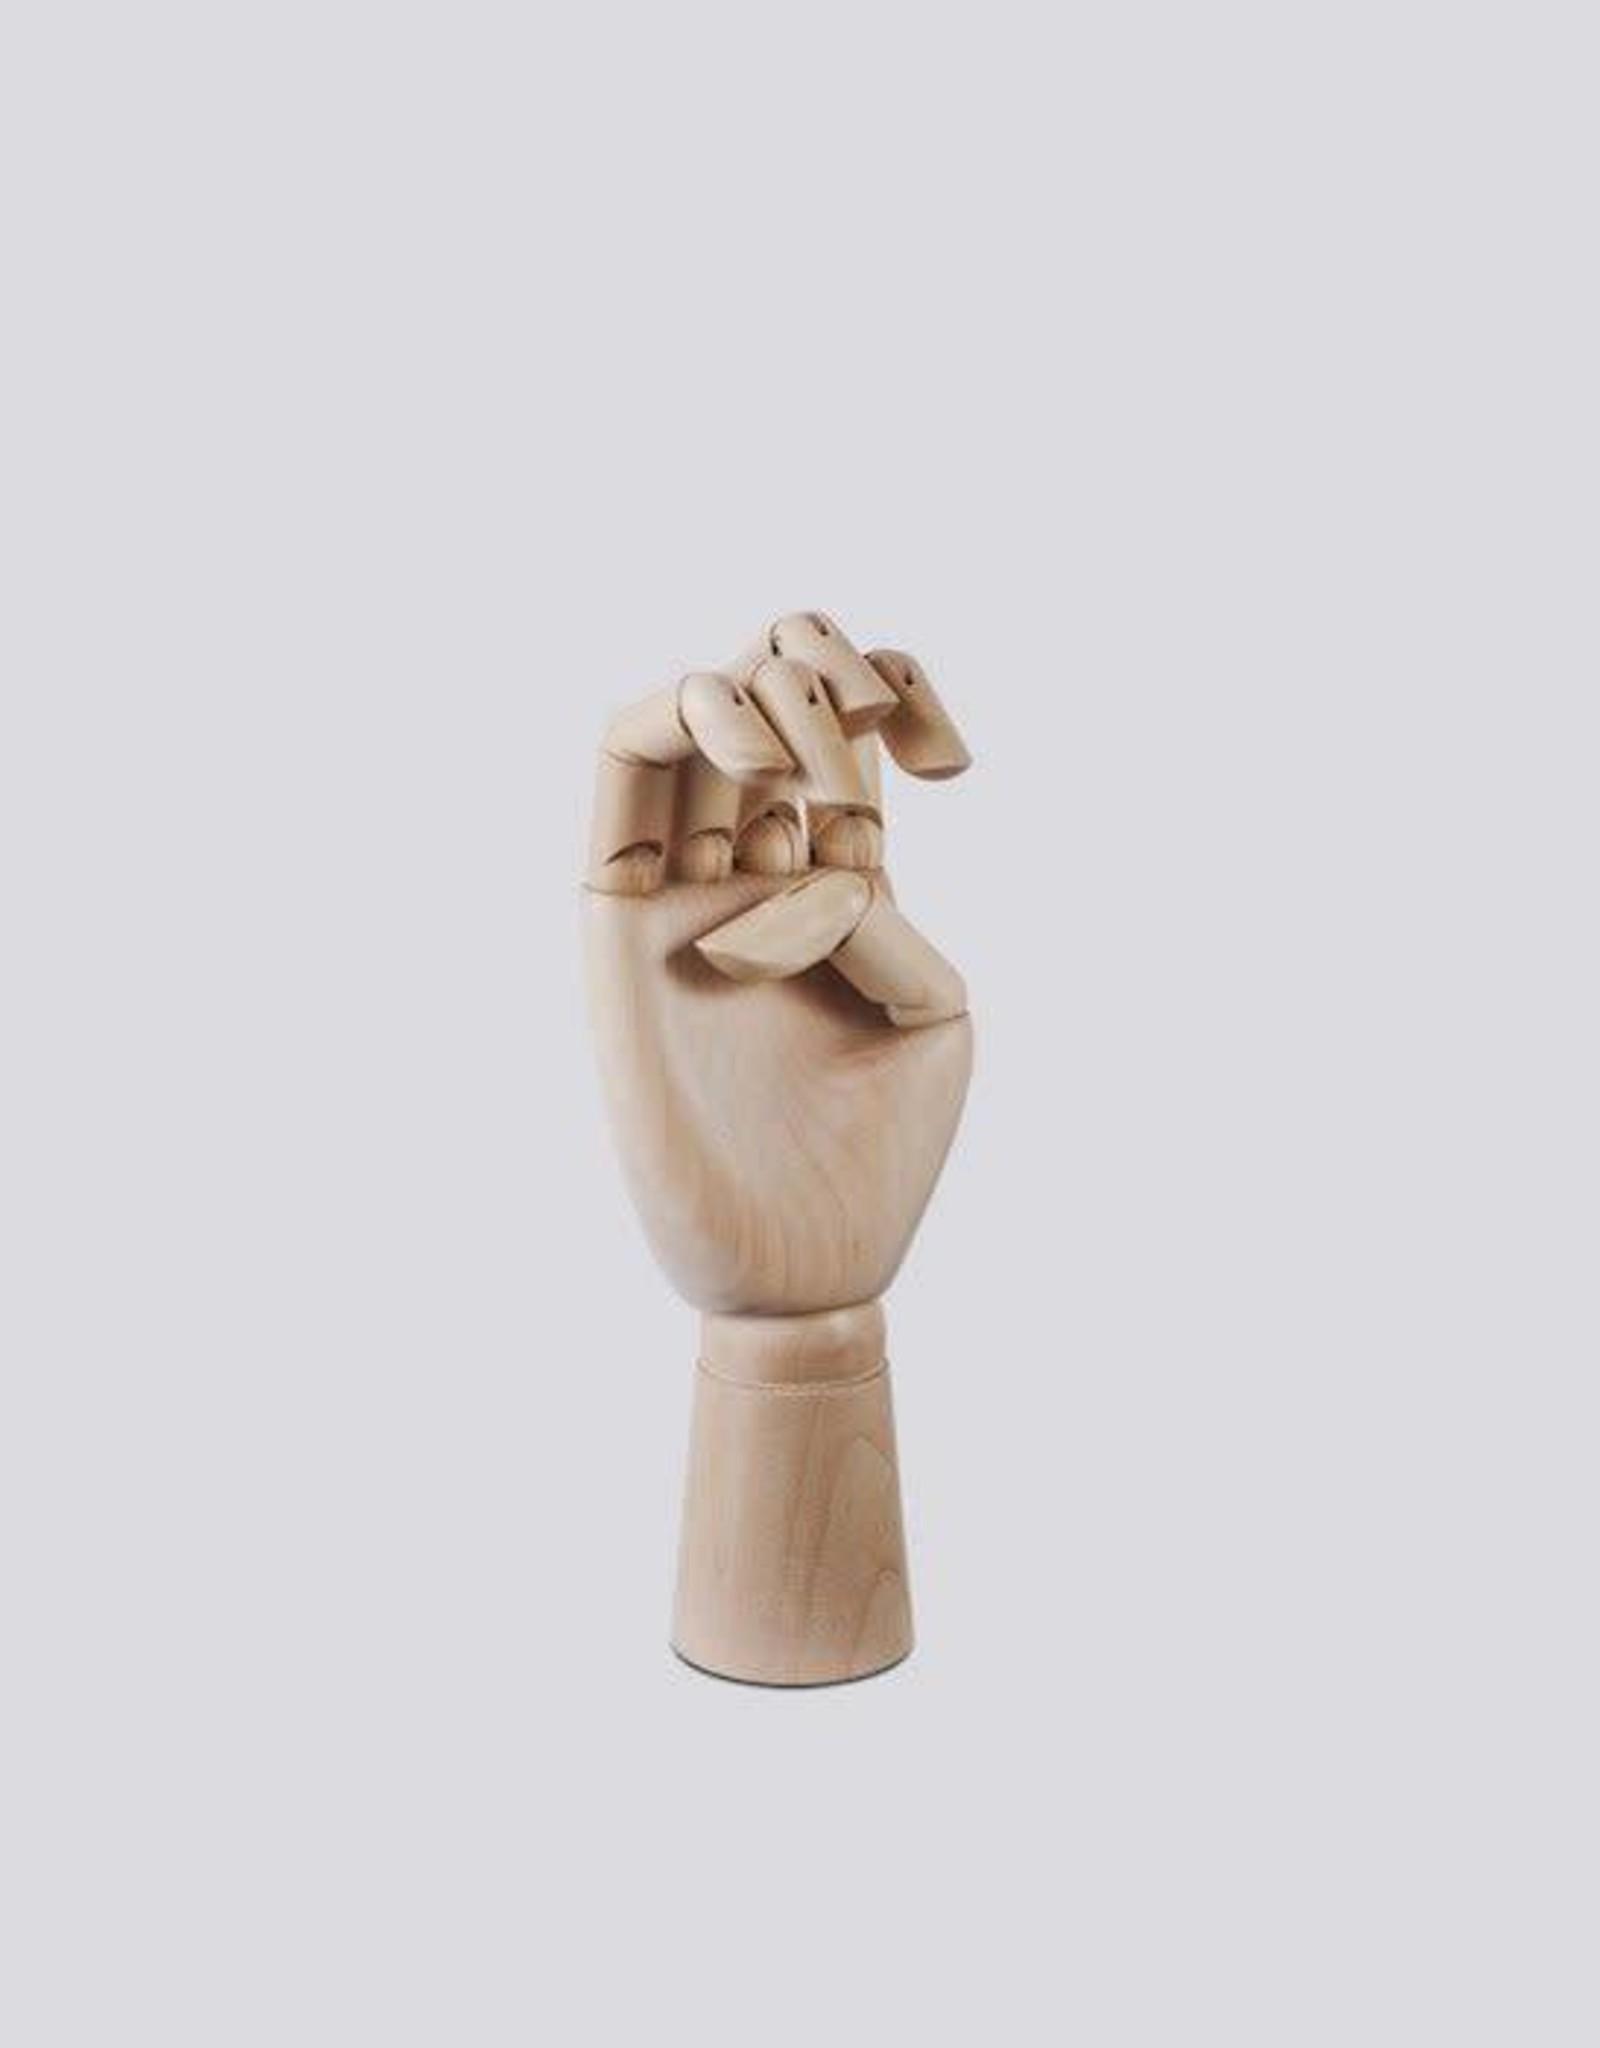 Hay Wooden Hand M - Hay